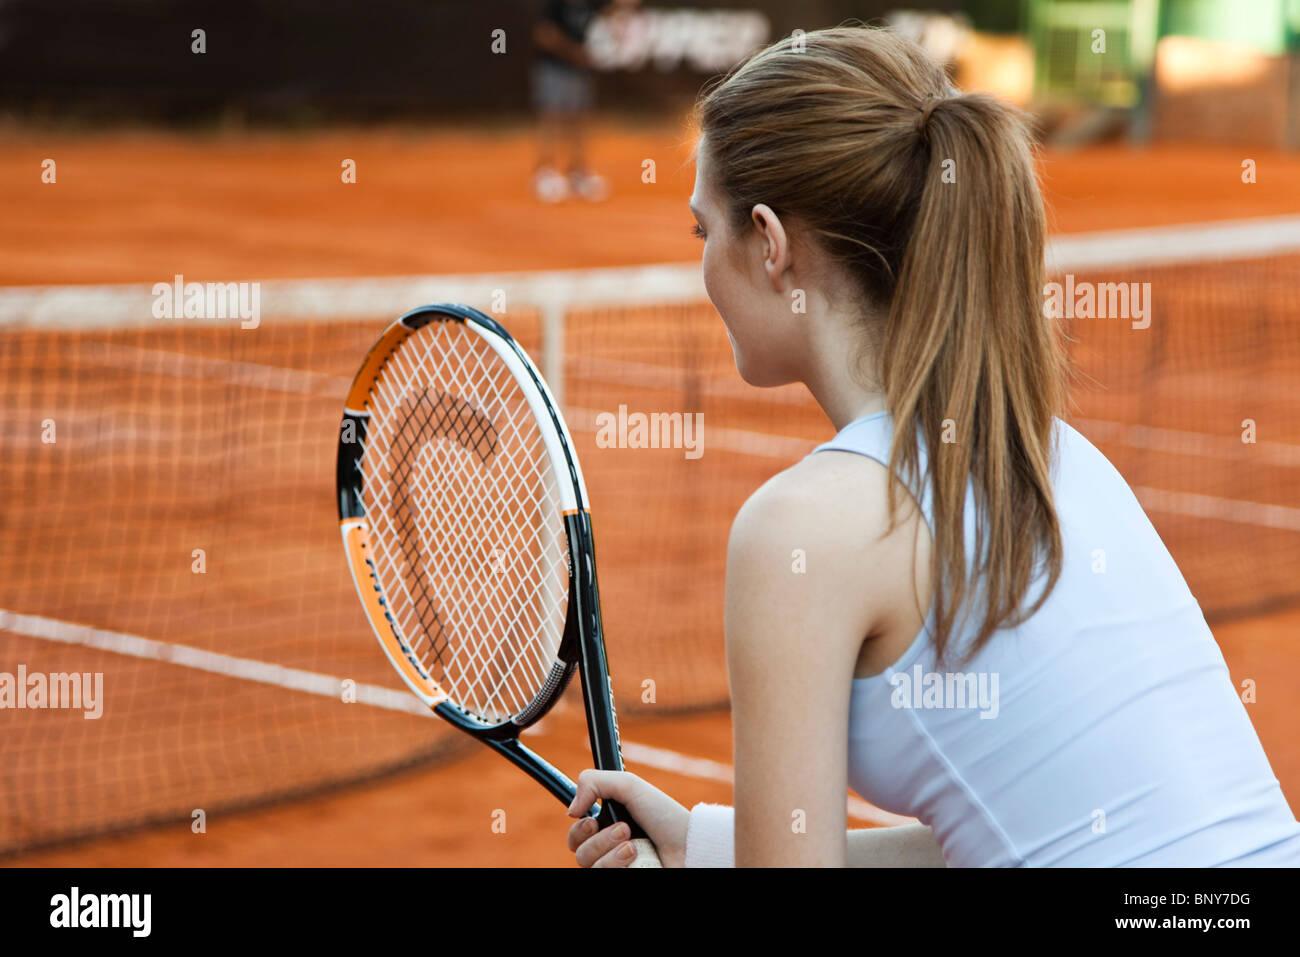 Teenage girl playing tennis - Stock Image